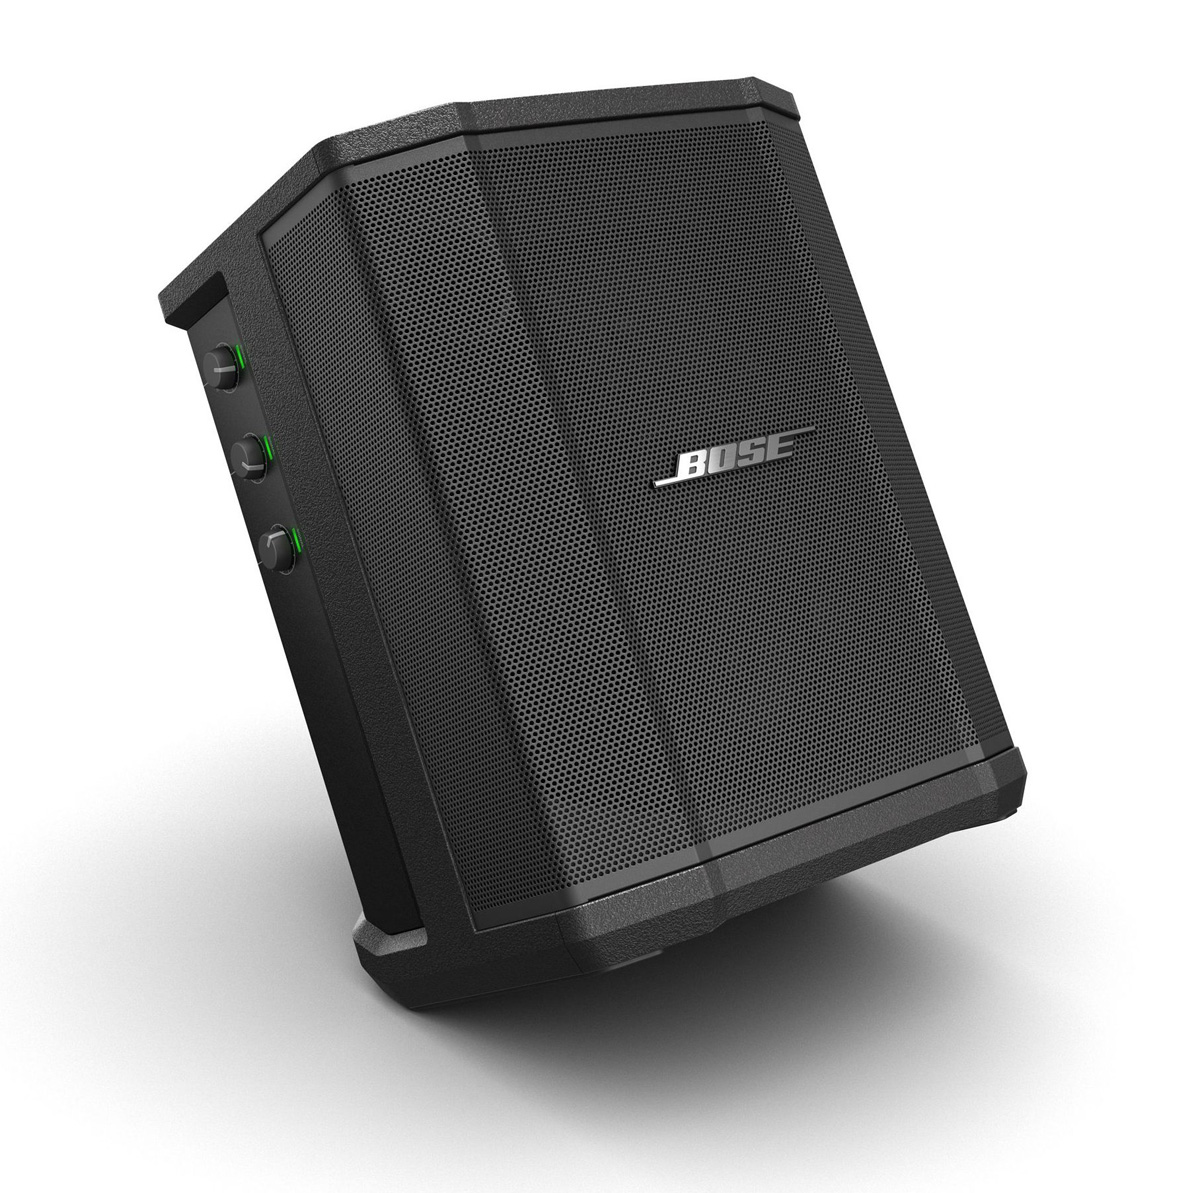 BOSE ボーズ / S1 Pro Multi-Position PA system ポータブルPAシステム 【リチウムイオンバッテリー(S1 Pro battery)付】